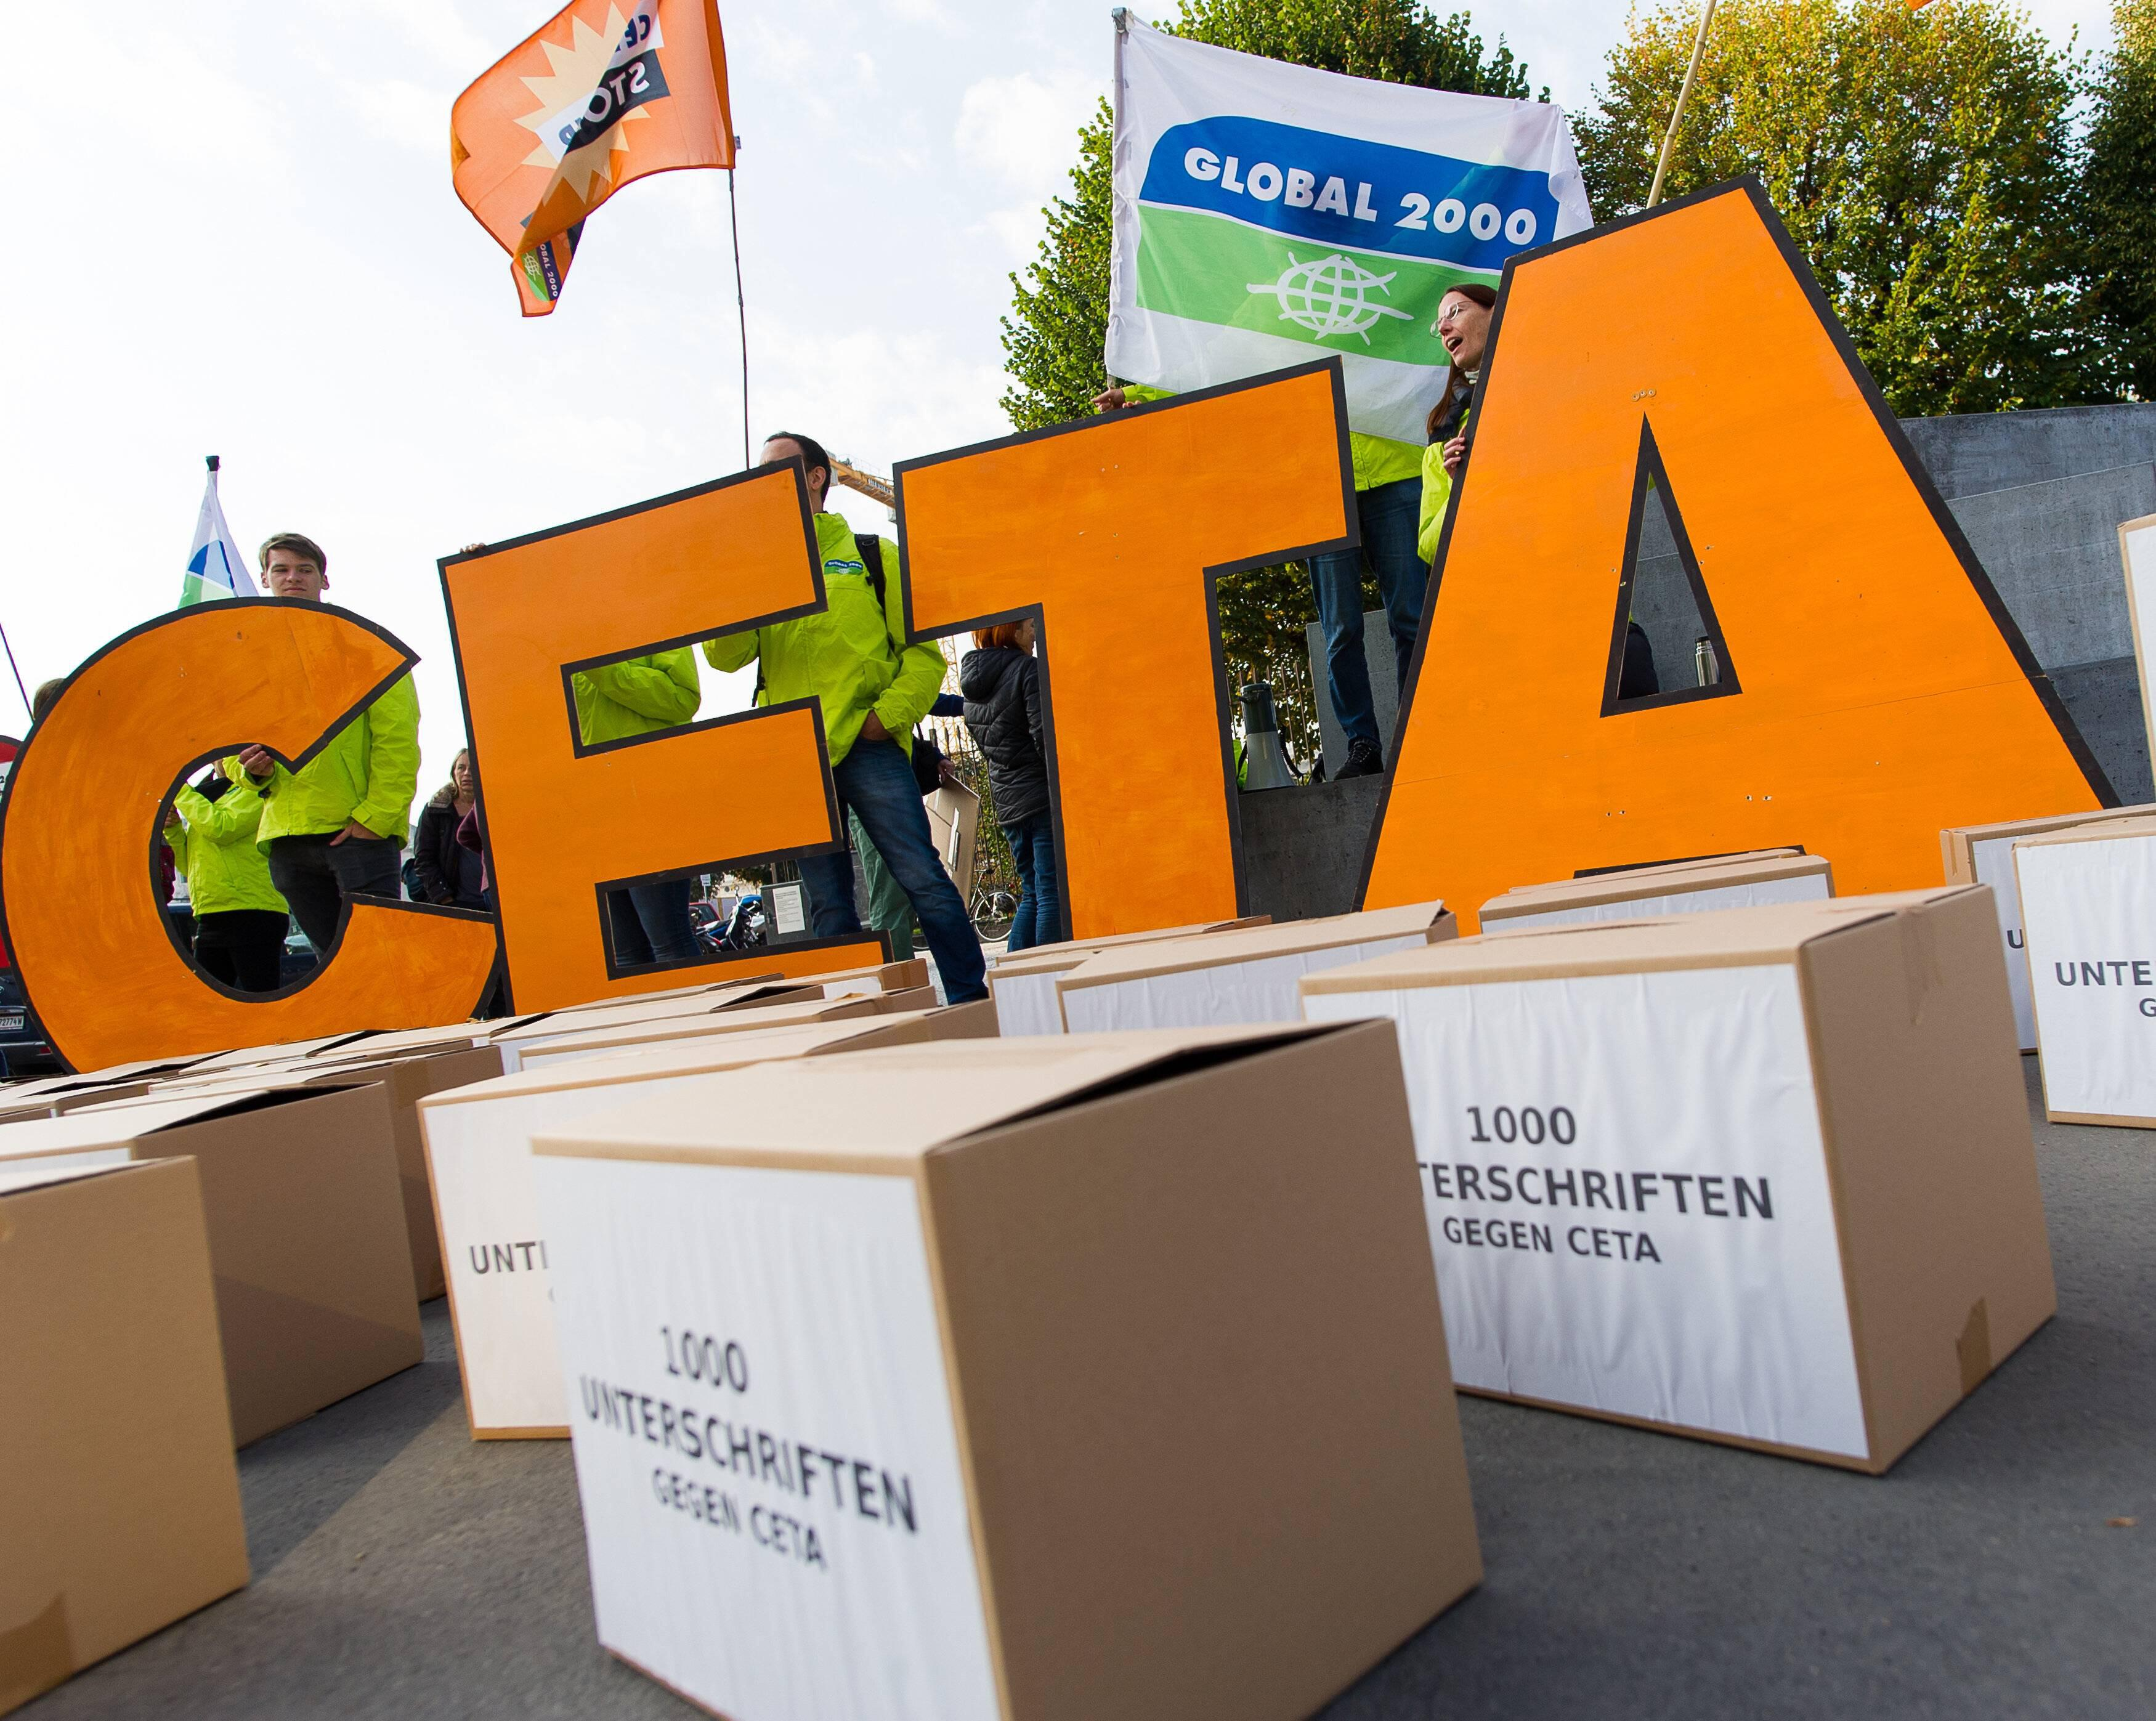 Bild zu CETA, TTIP, Handelsabkommen, Belgien